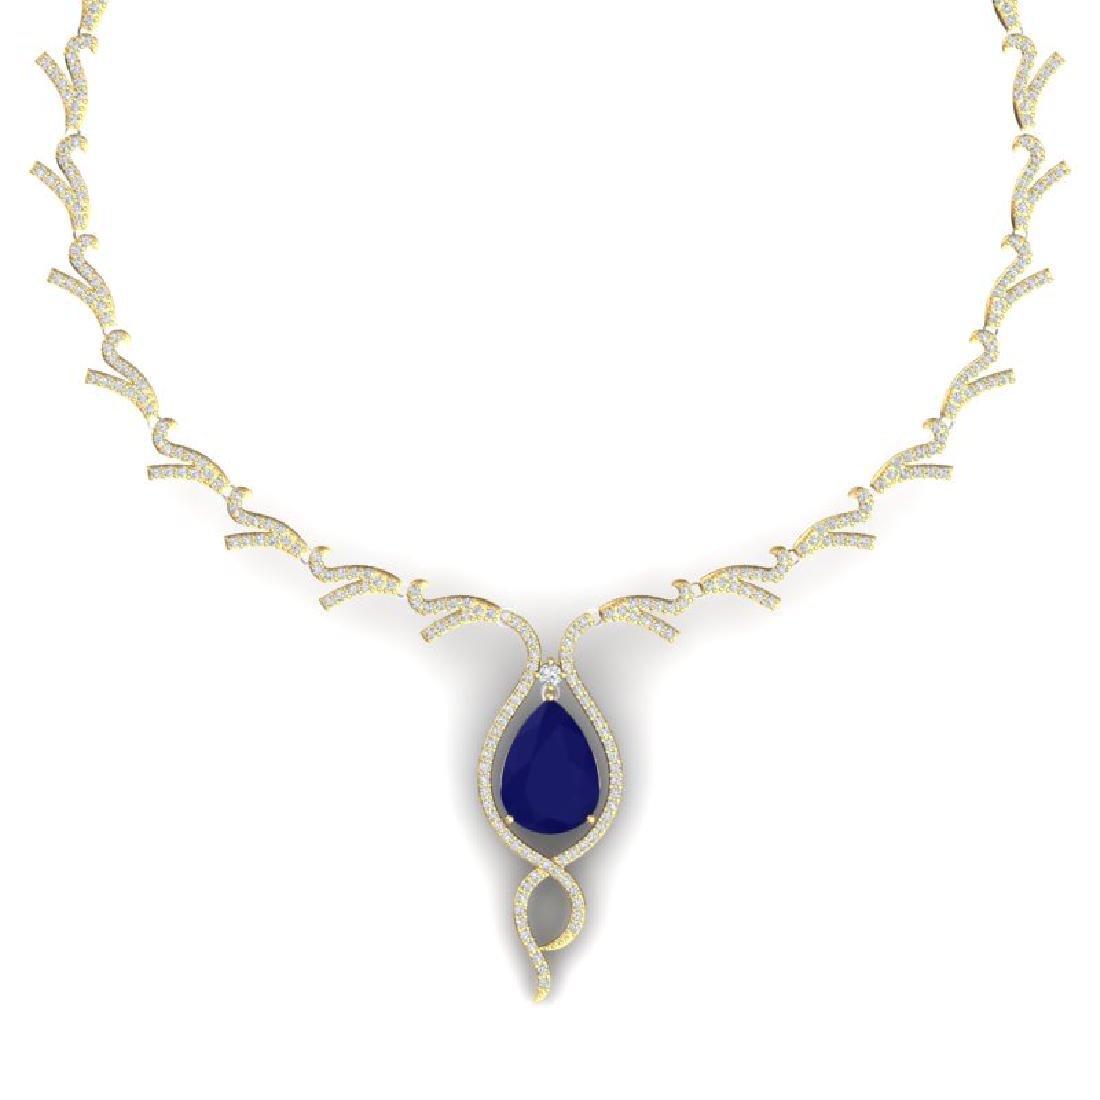 23.43 CTW Royalty Sapphire & VS Diamond Necklace 18K